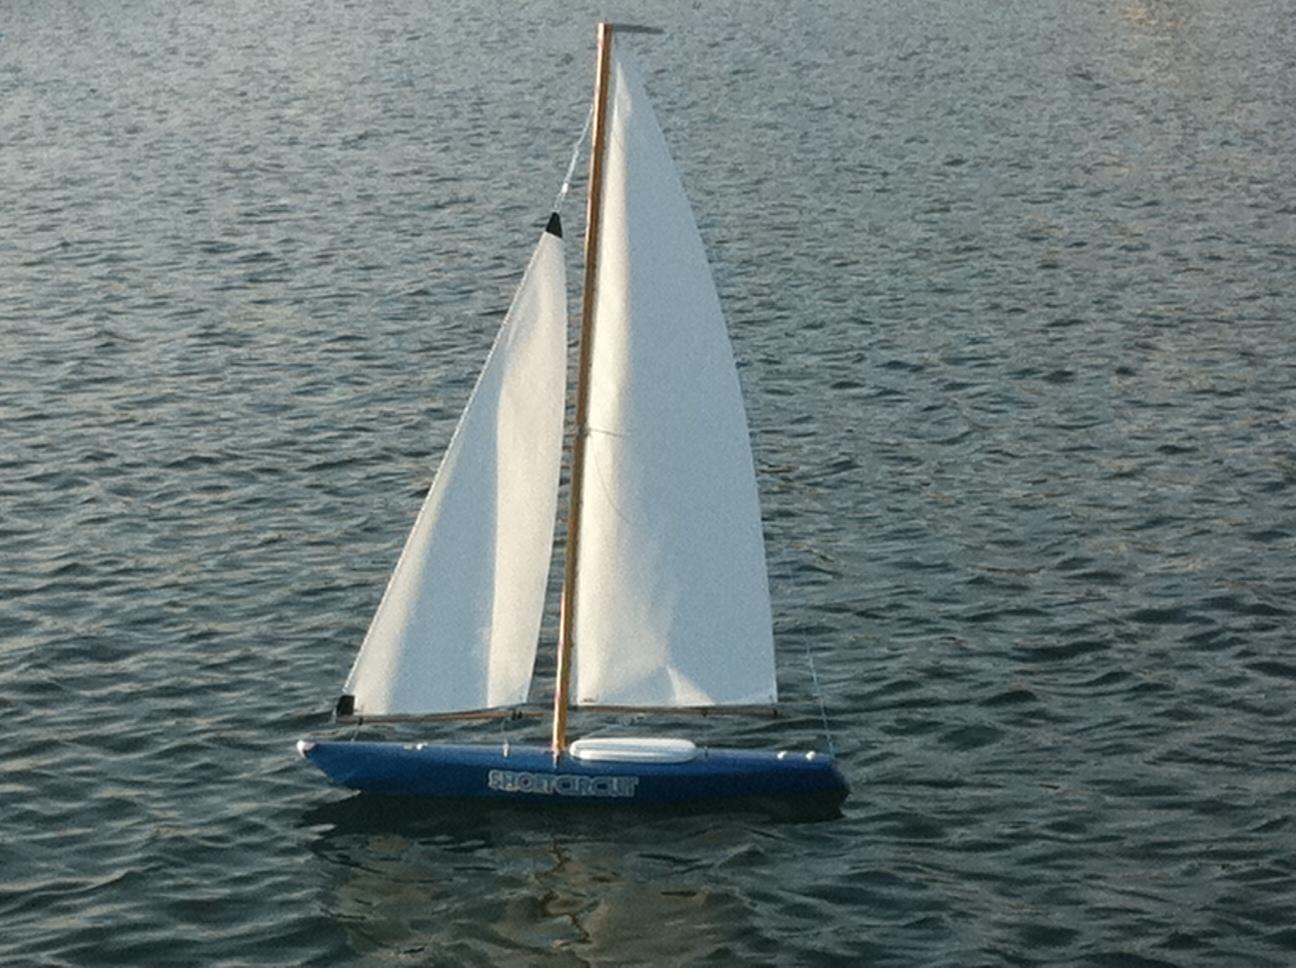 Arduskipper 2011 Marine Wiring Diagrams Sailboat Mast Soling 1m Shortcircuit